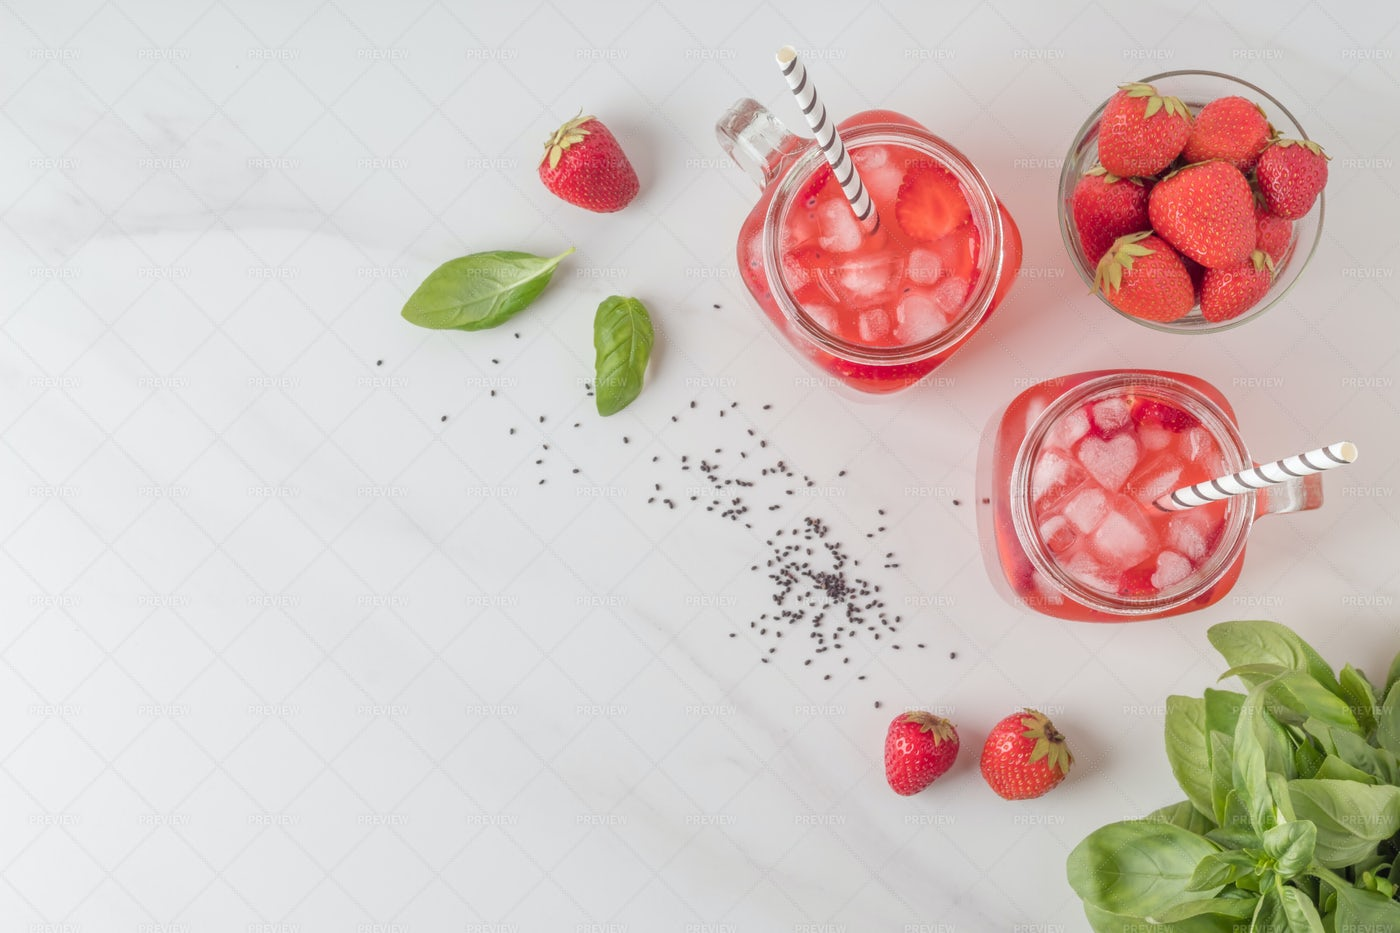 Yummy Strawberry Drinks: Stock Photos